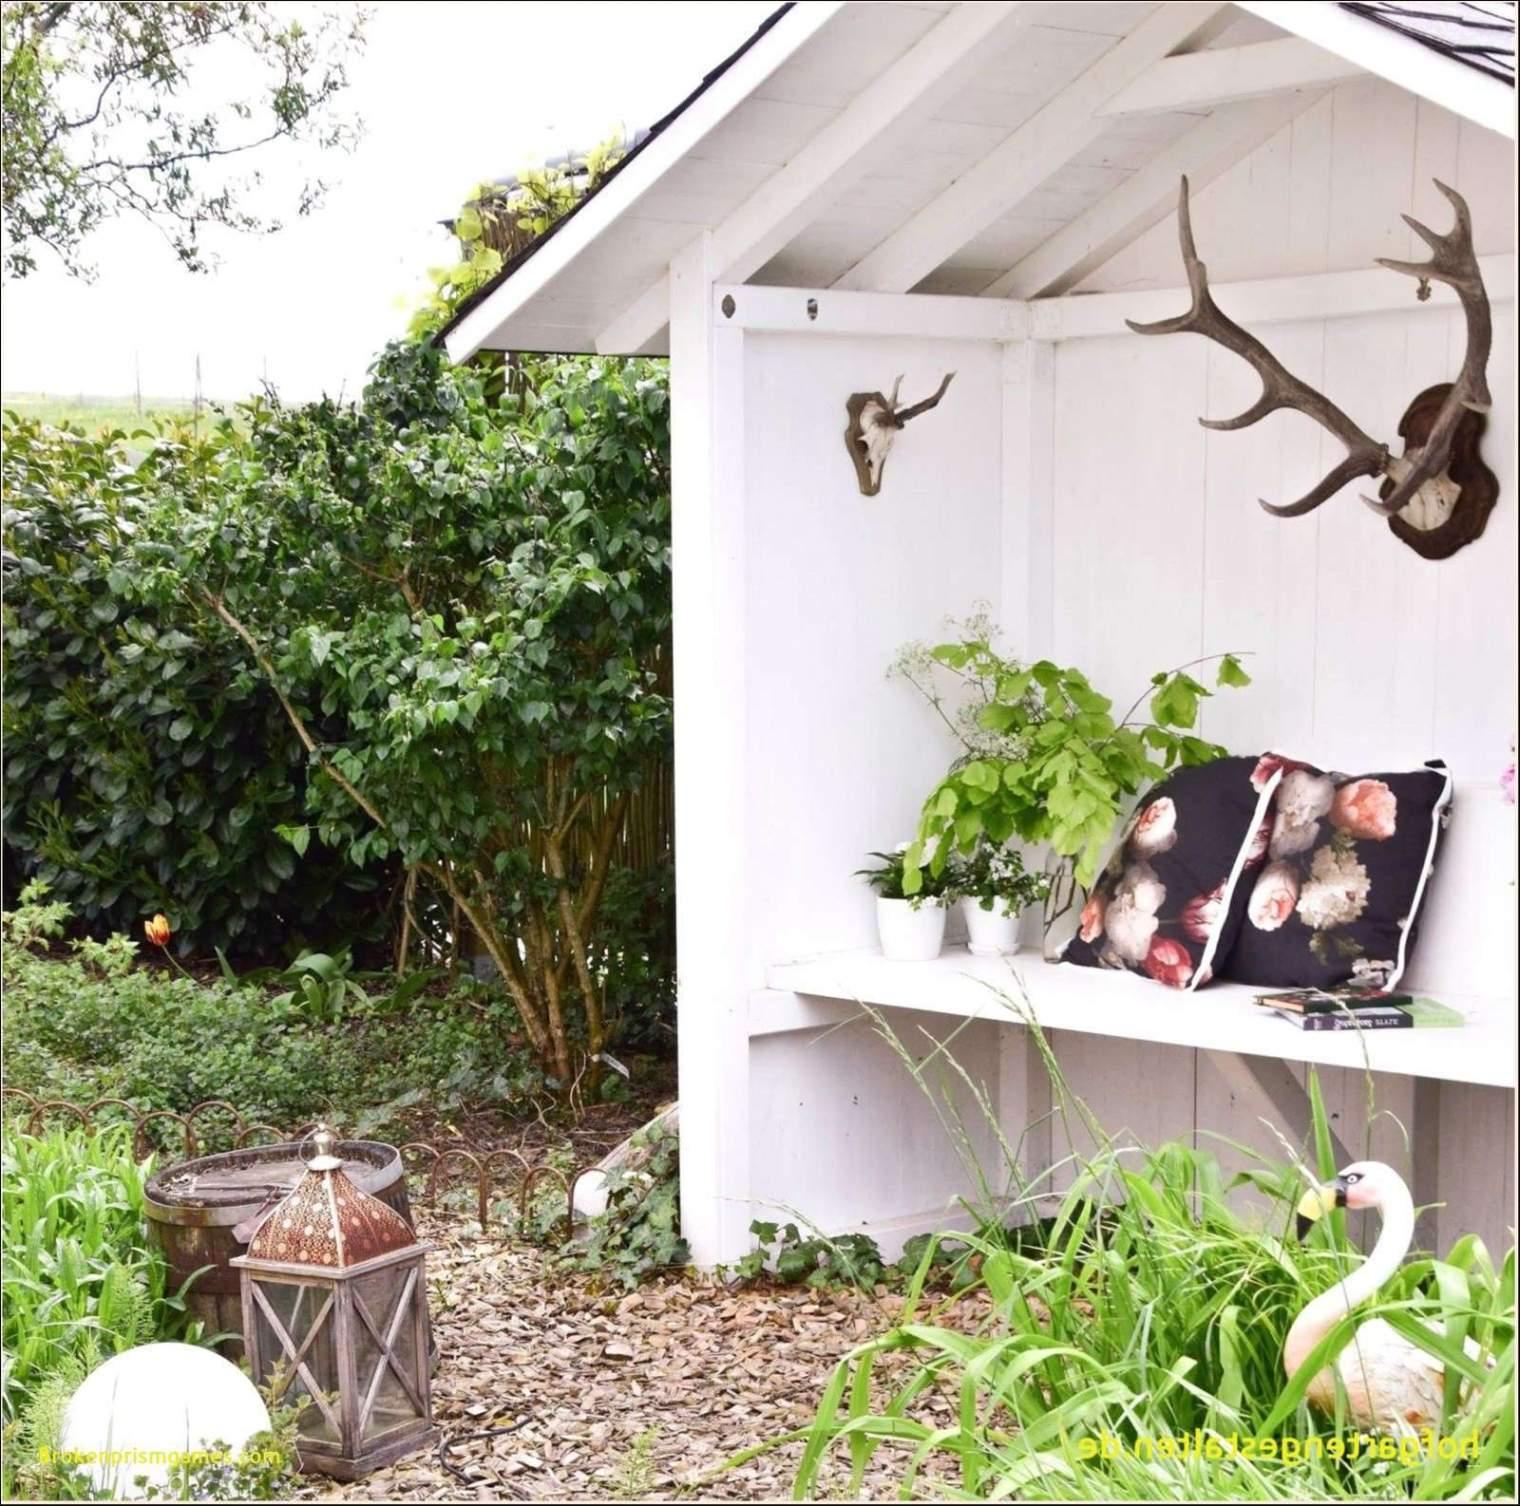 46 neu terrassenuberdachung aus holland stock wintergarten aus holland wintergarten aus holland 5